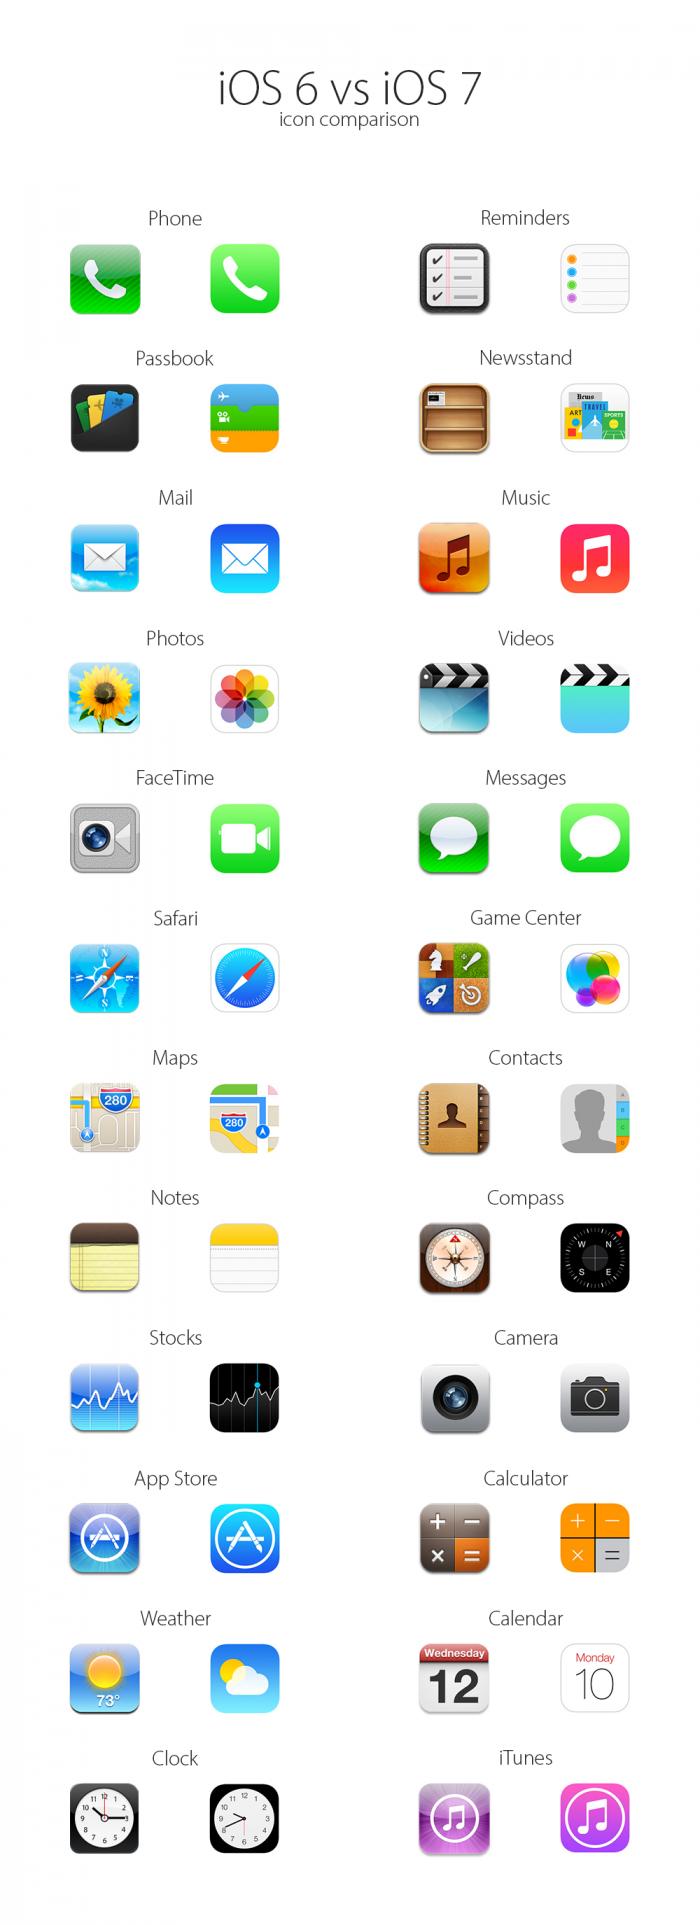 iOS6vsiOS7 icons